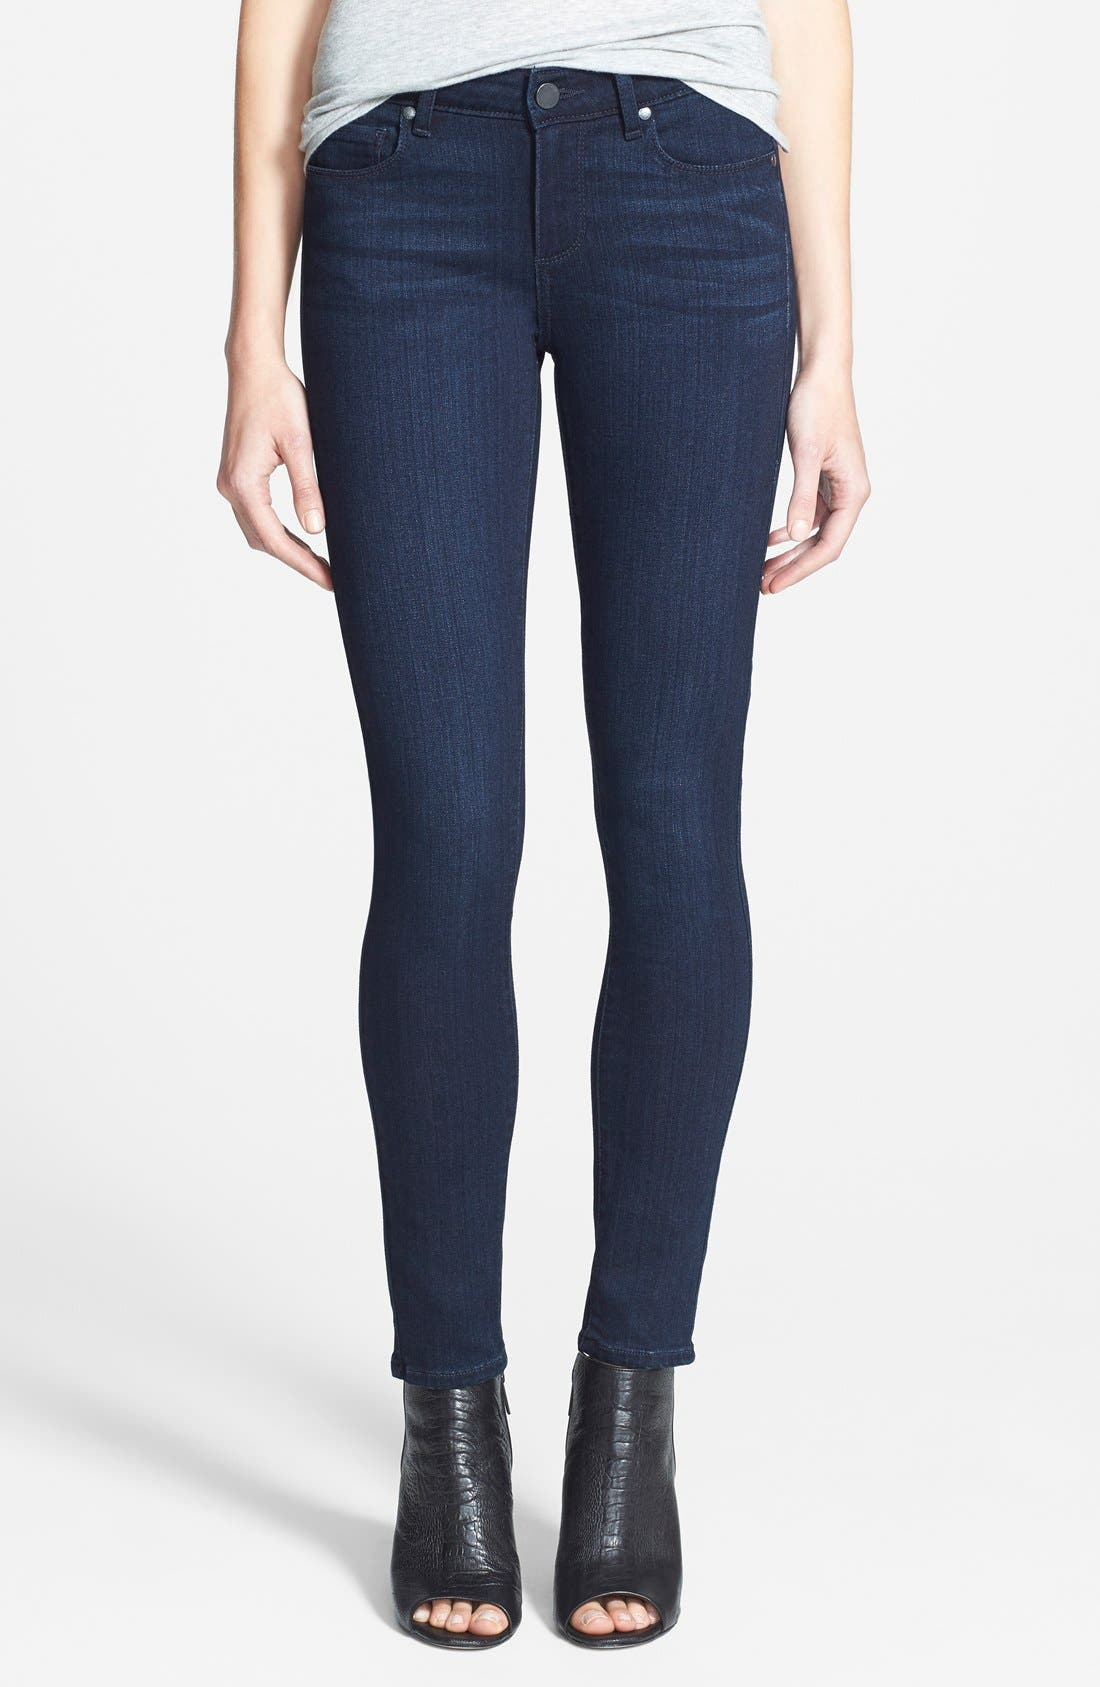 PAIGE Transcend - Verdugo Ankle Jeans (Mae)